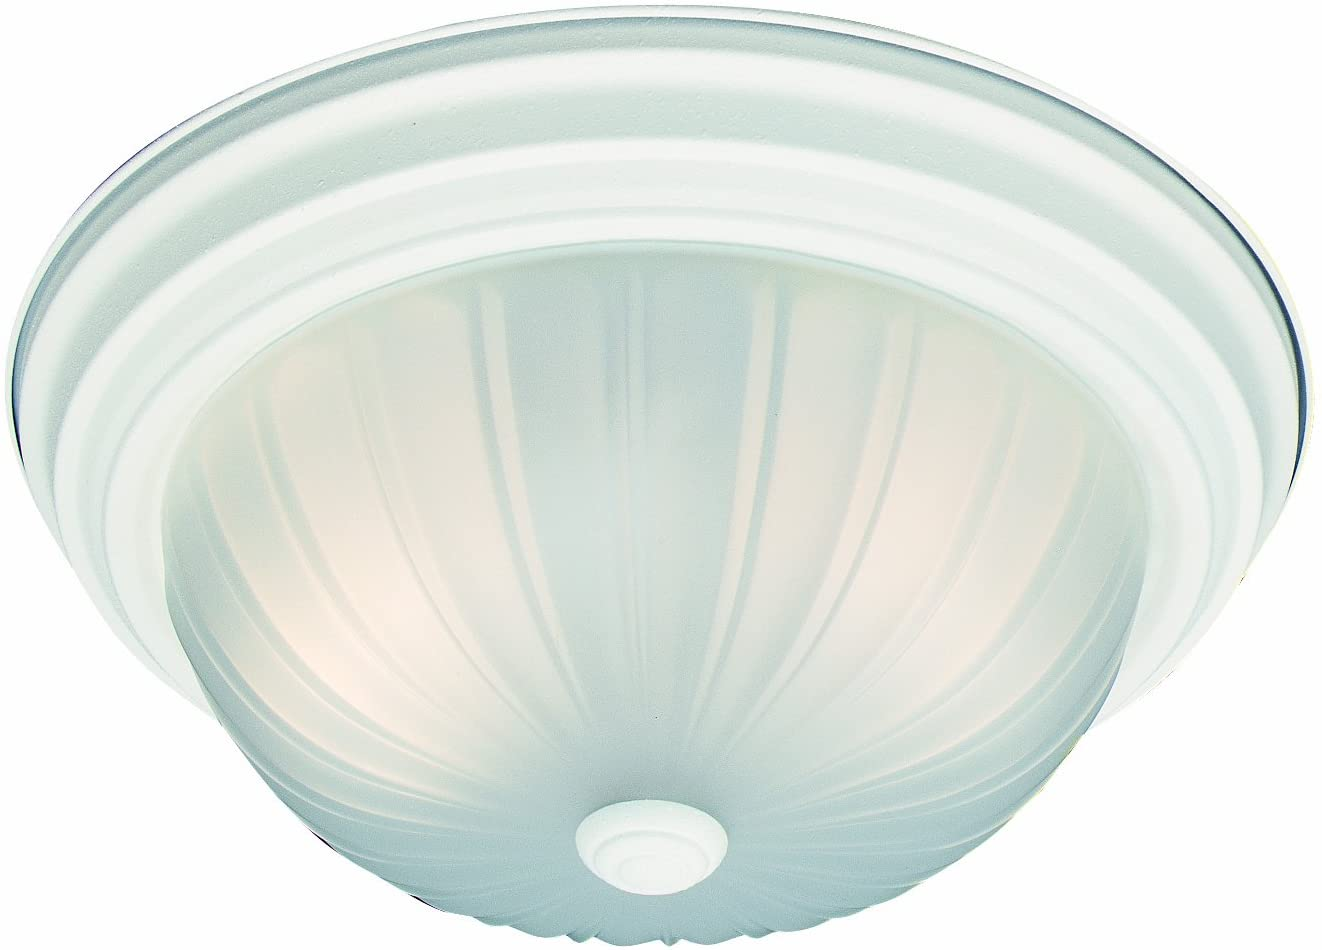 Thomas Lighting SL868218 Ceiling Essentials Ceiling Light, Textured White